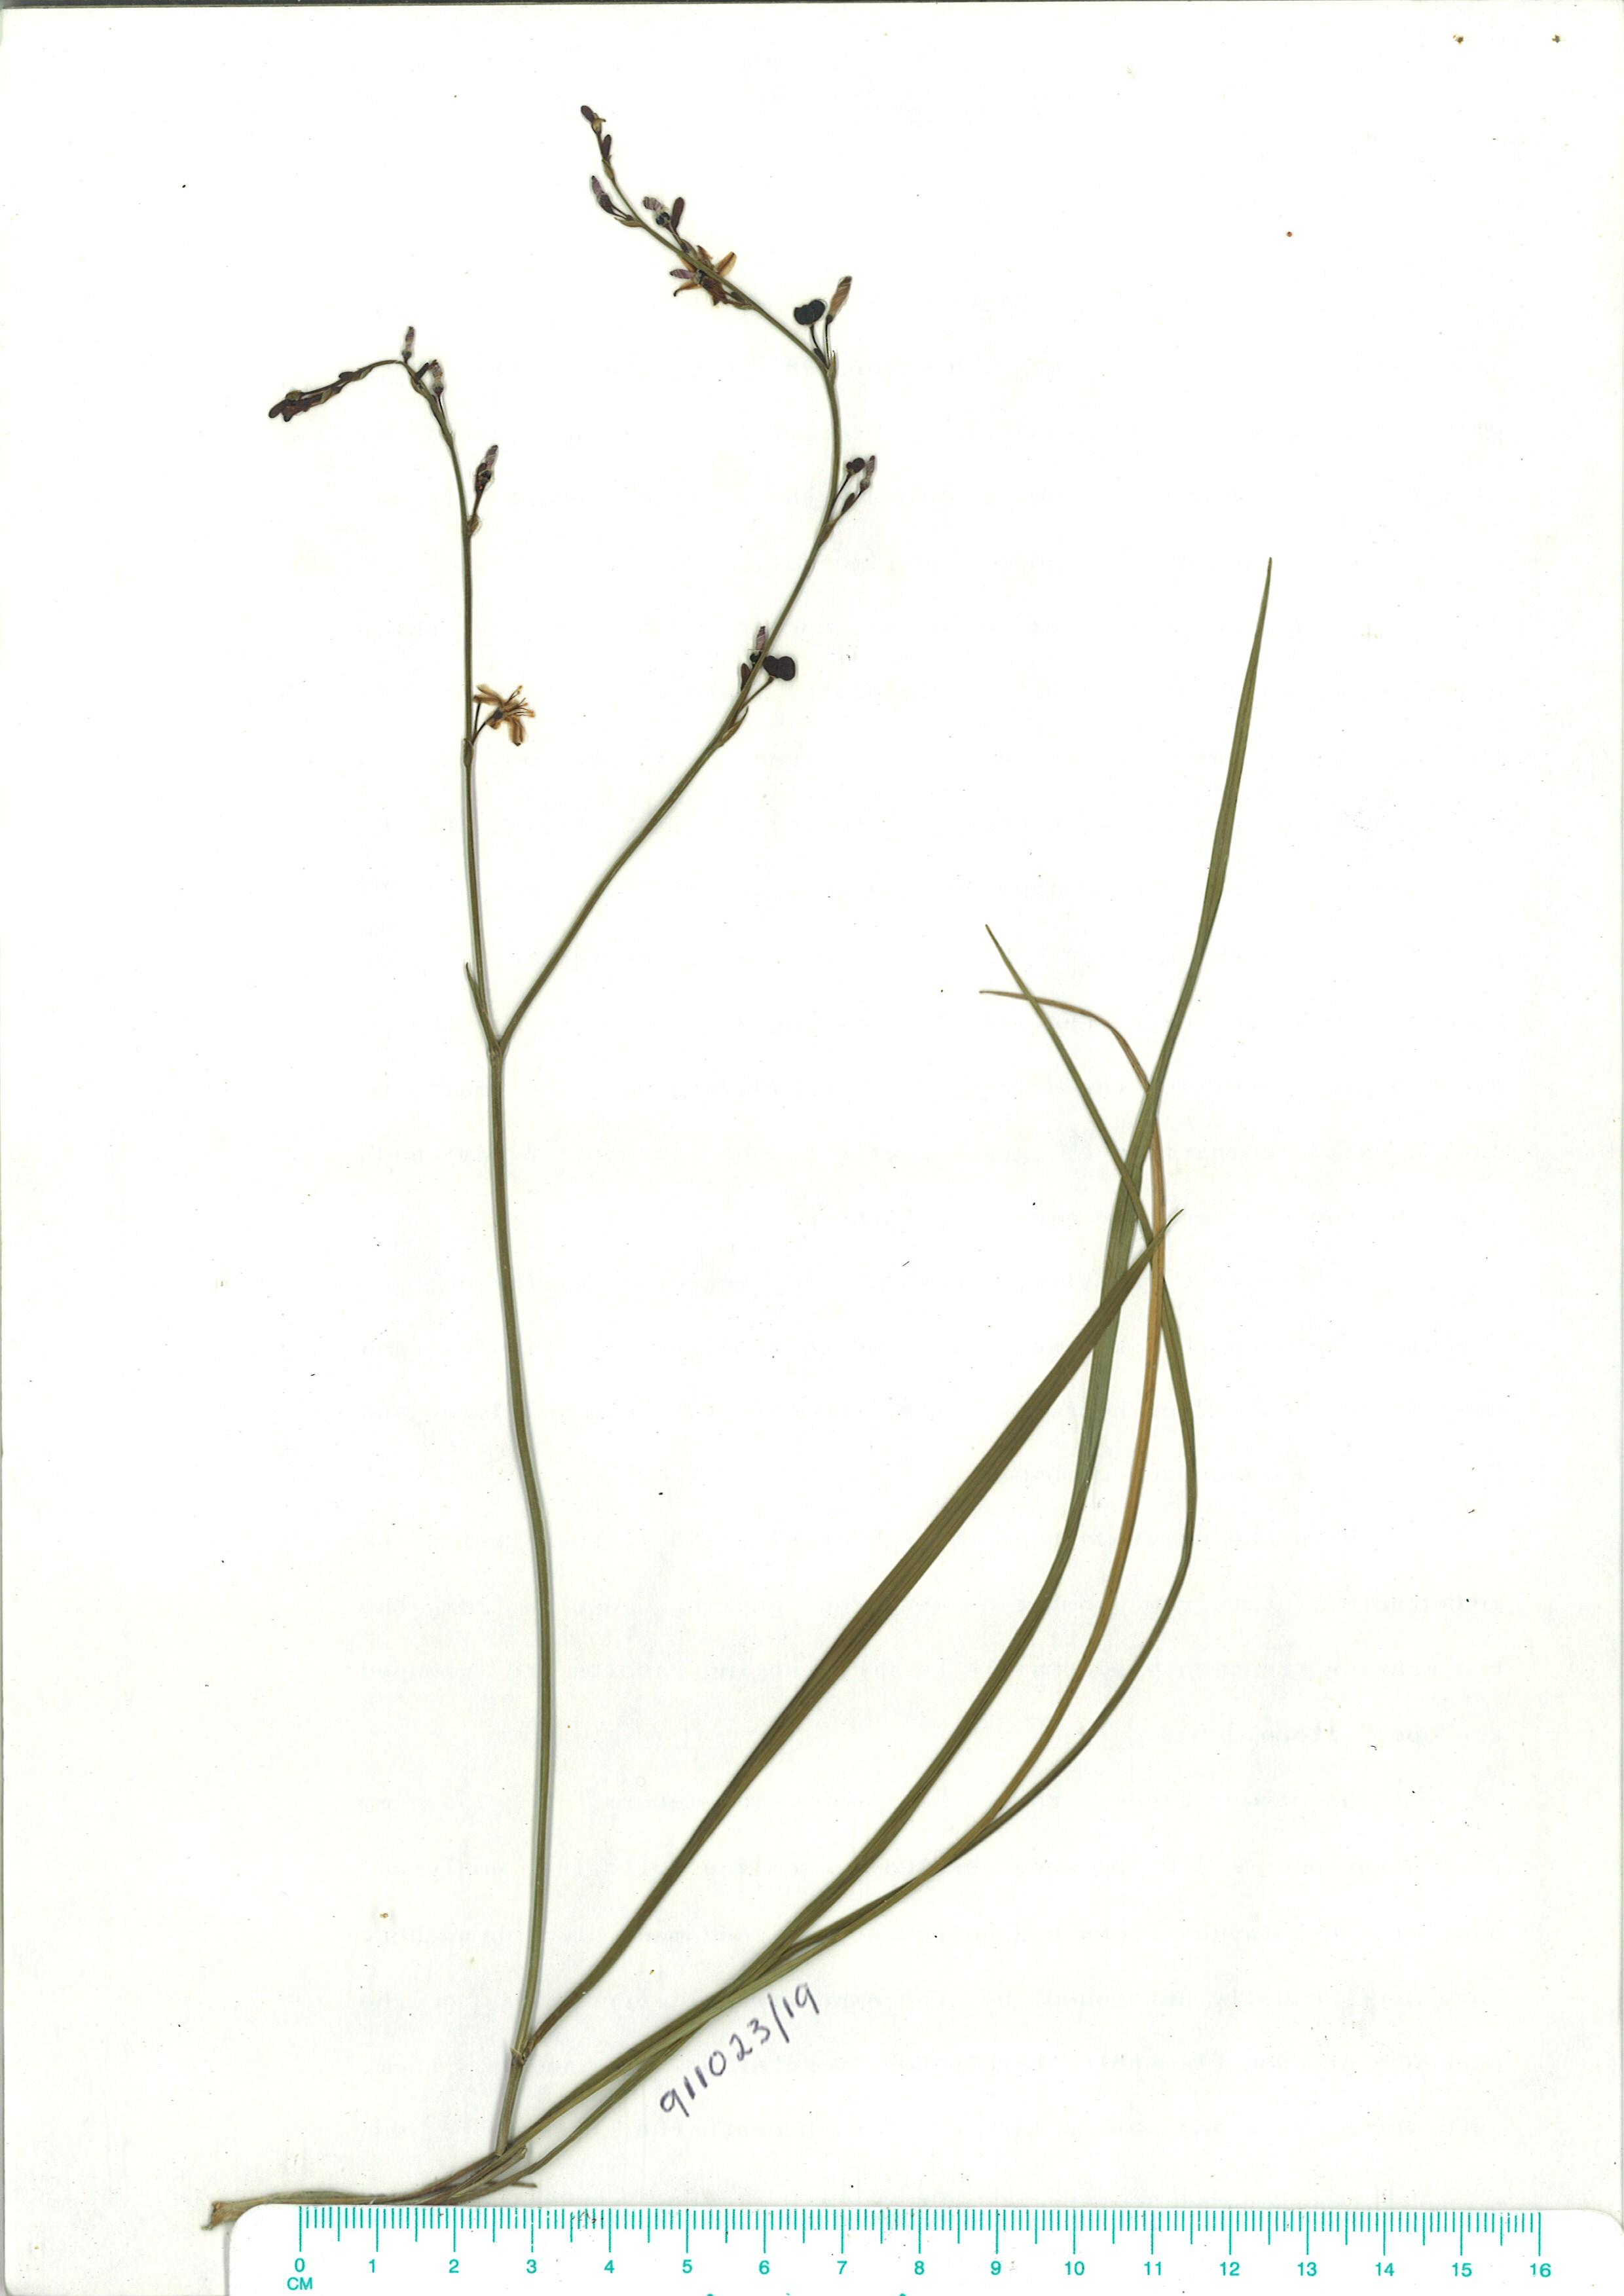 Scanned herbarium image of Caesia parvifloravar-vittata